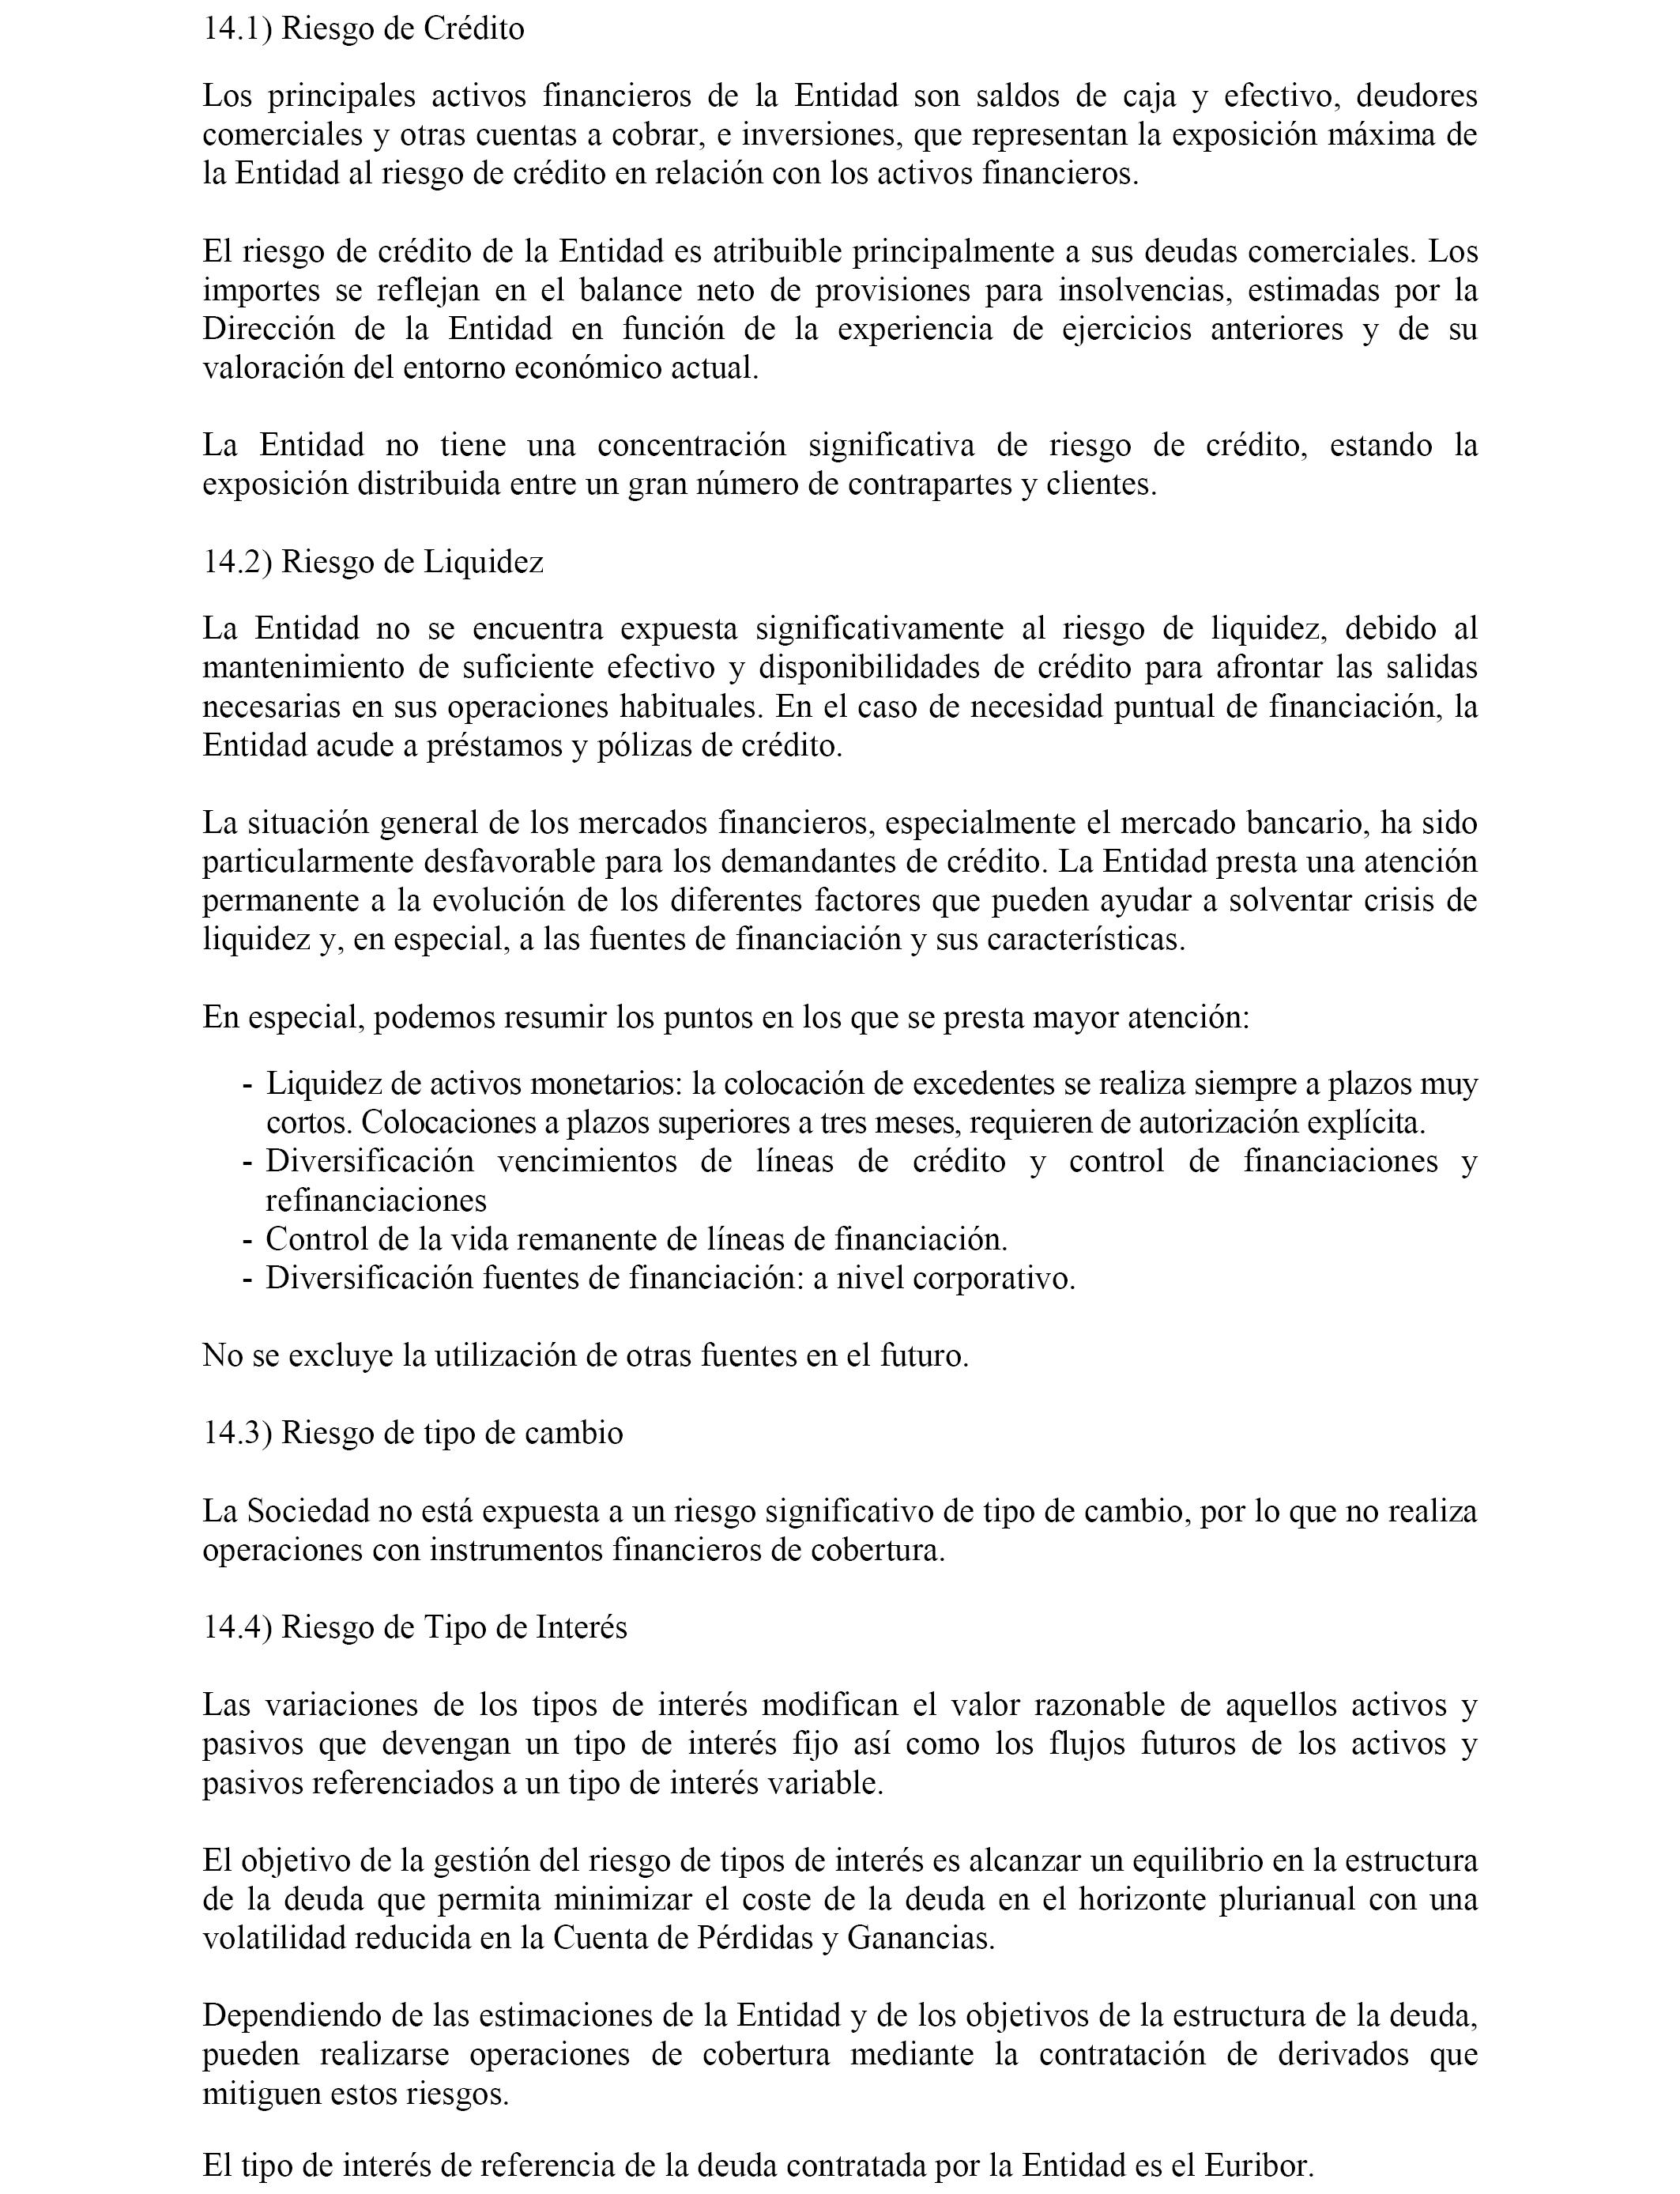 BOE.es - Documento BOE-A-2017-7793